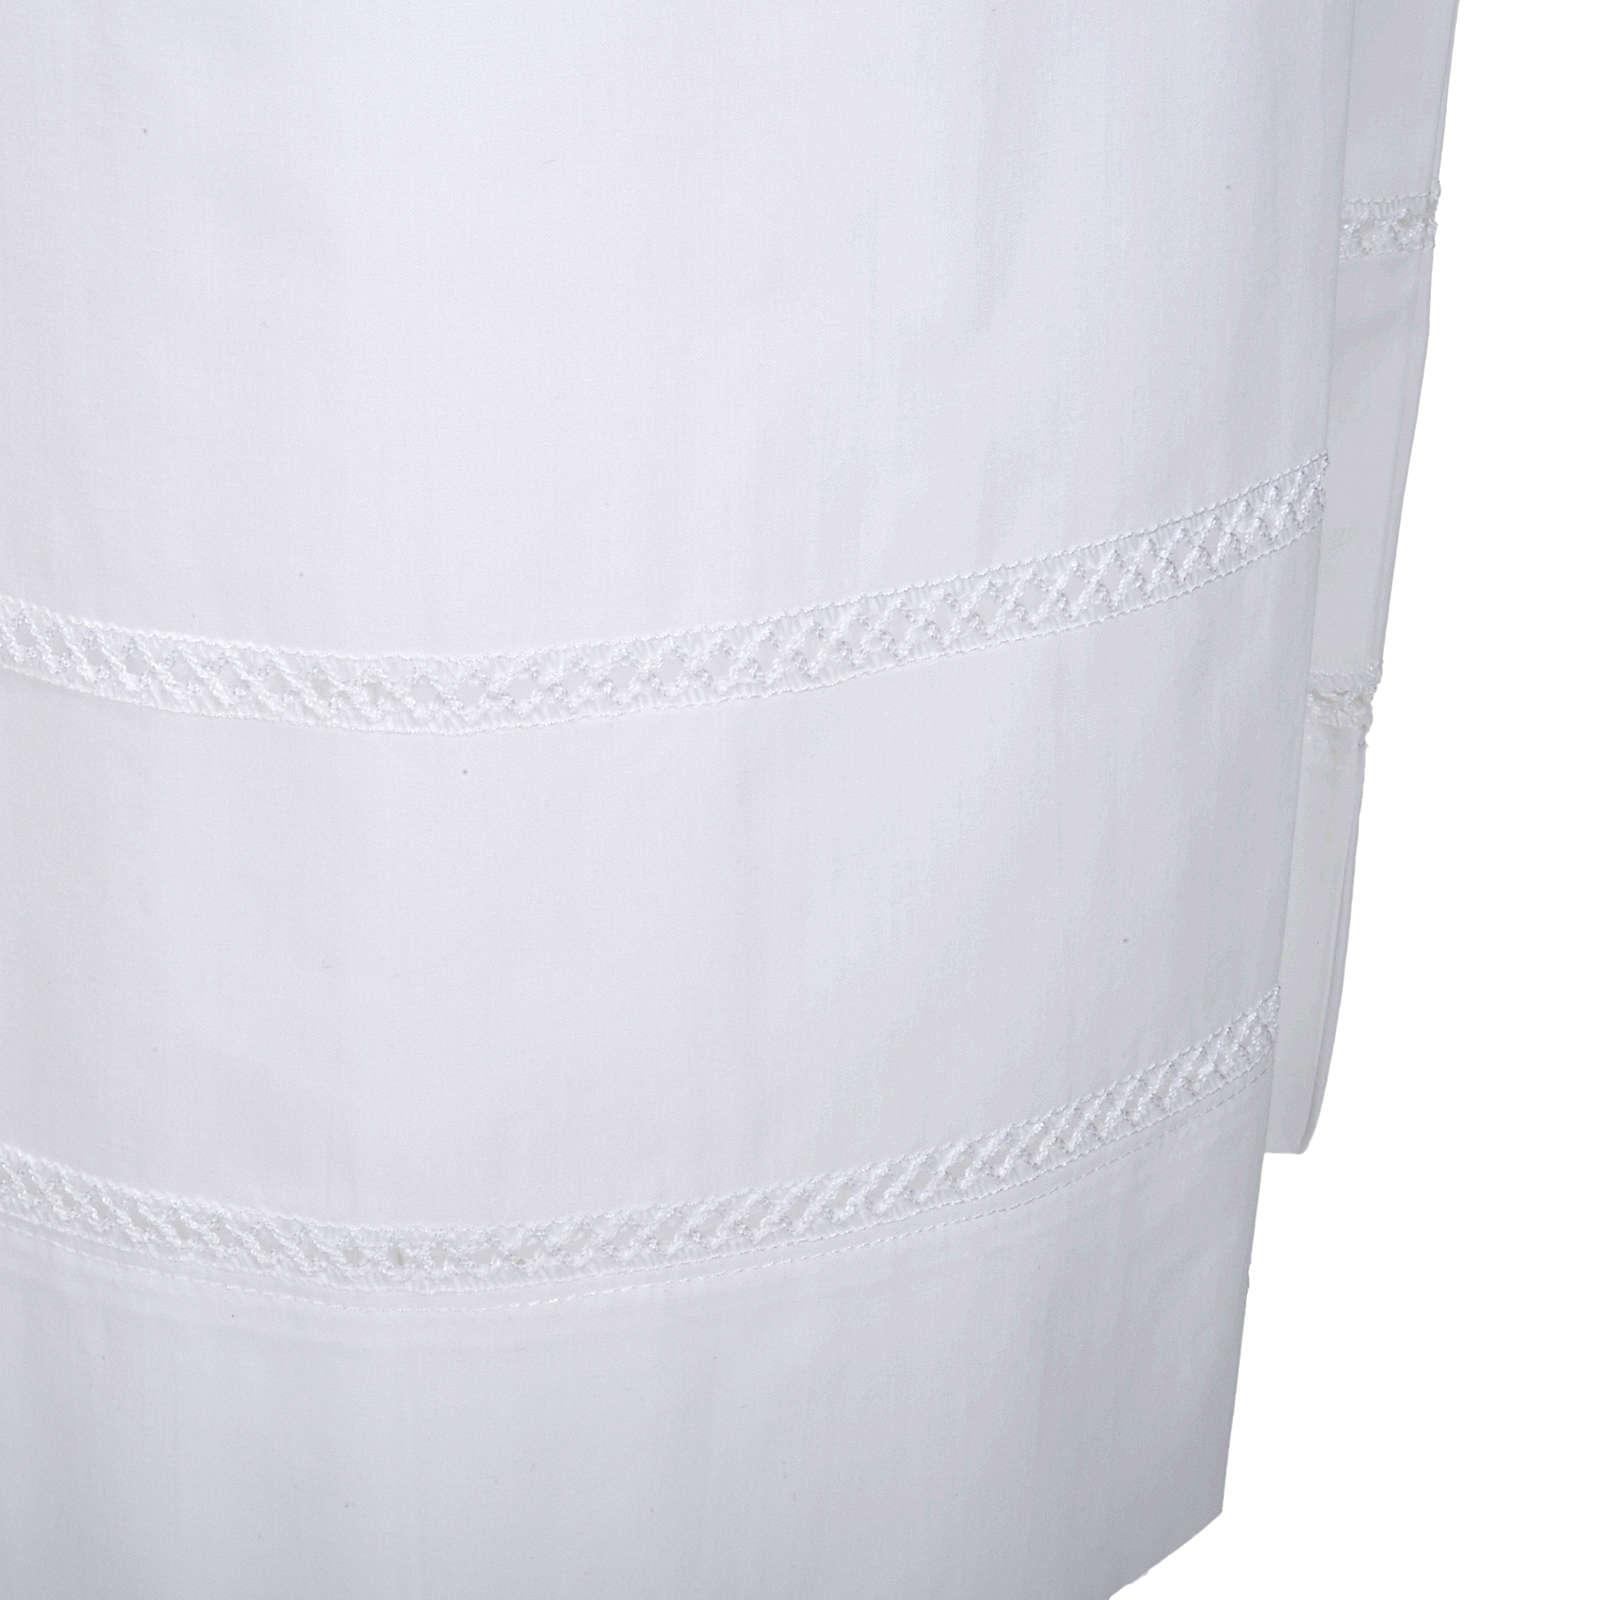 Camice bianco cotone decori bianchi 4